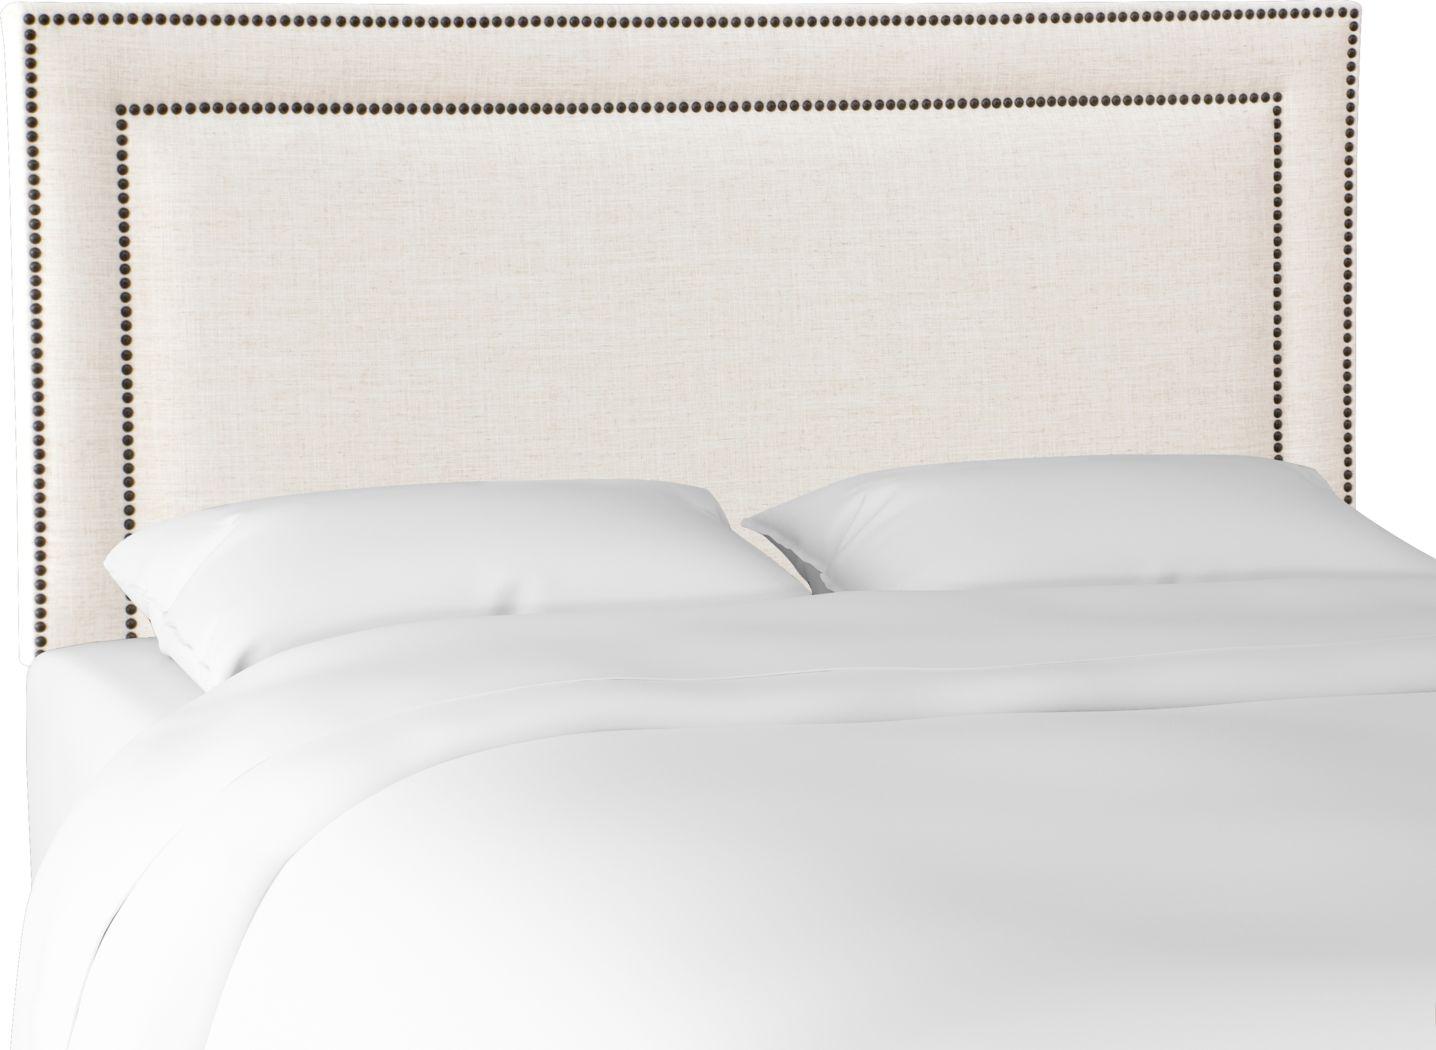 Mallay Linen King Upholstered Headboard